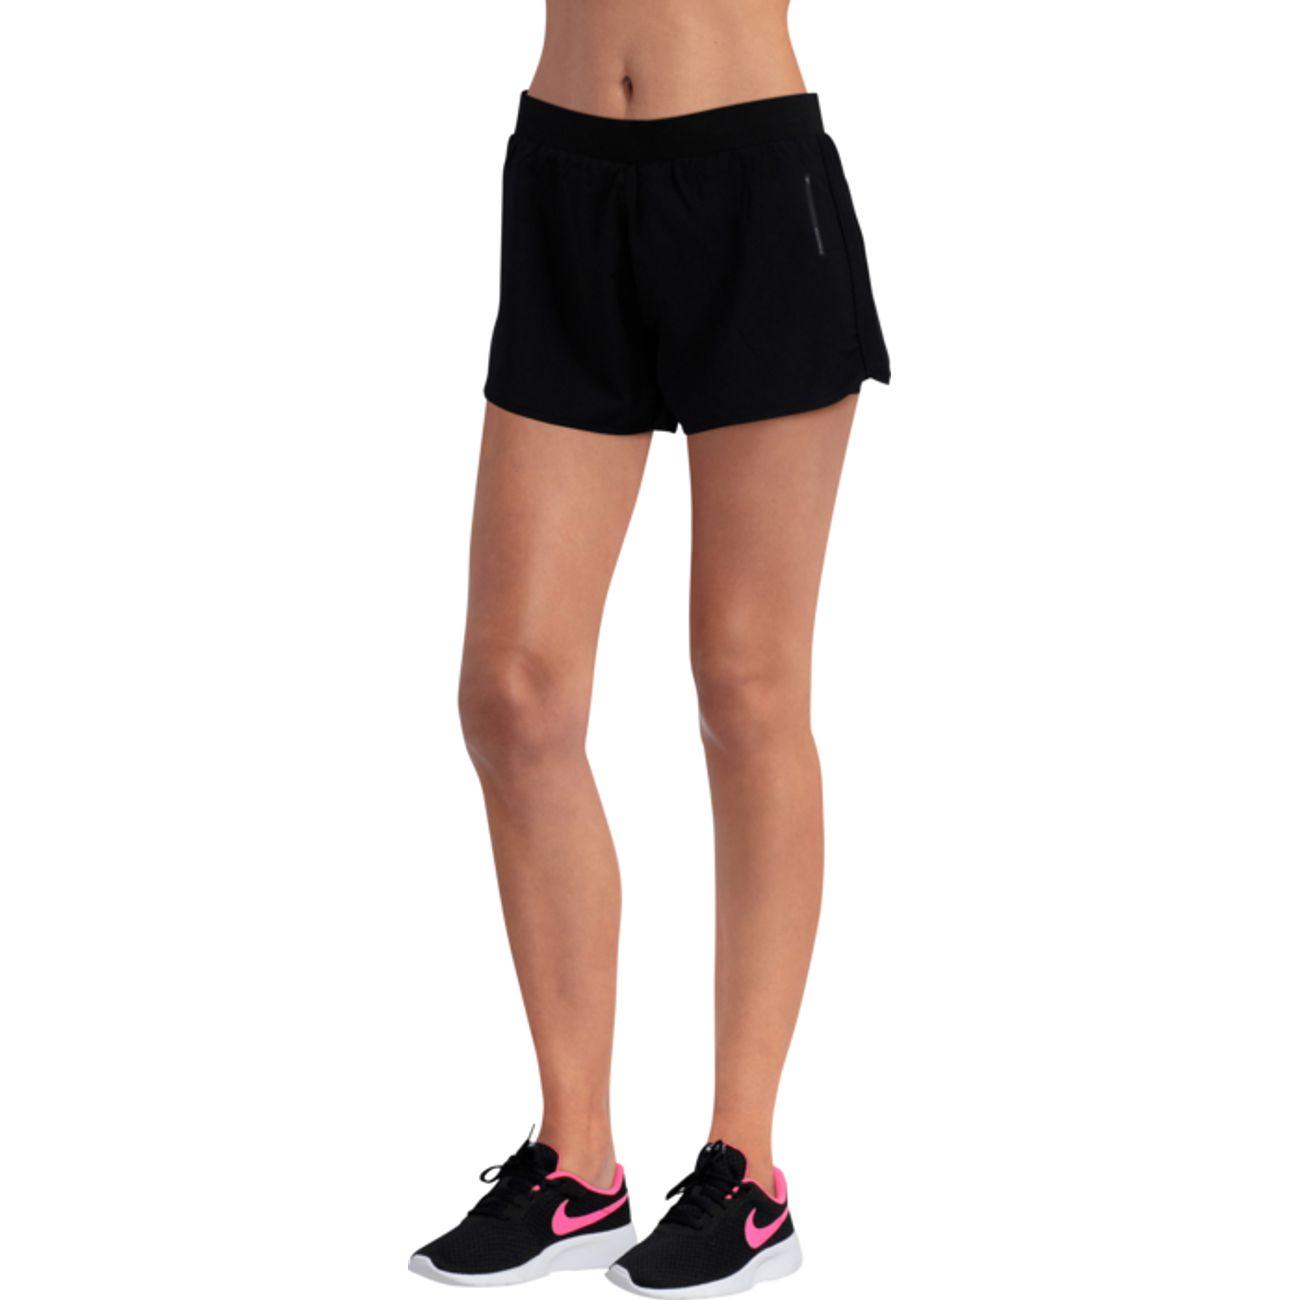 SHORT Fitness femme ATHLITECH ELISA